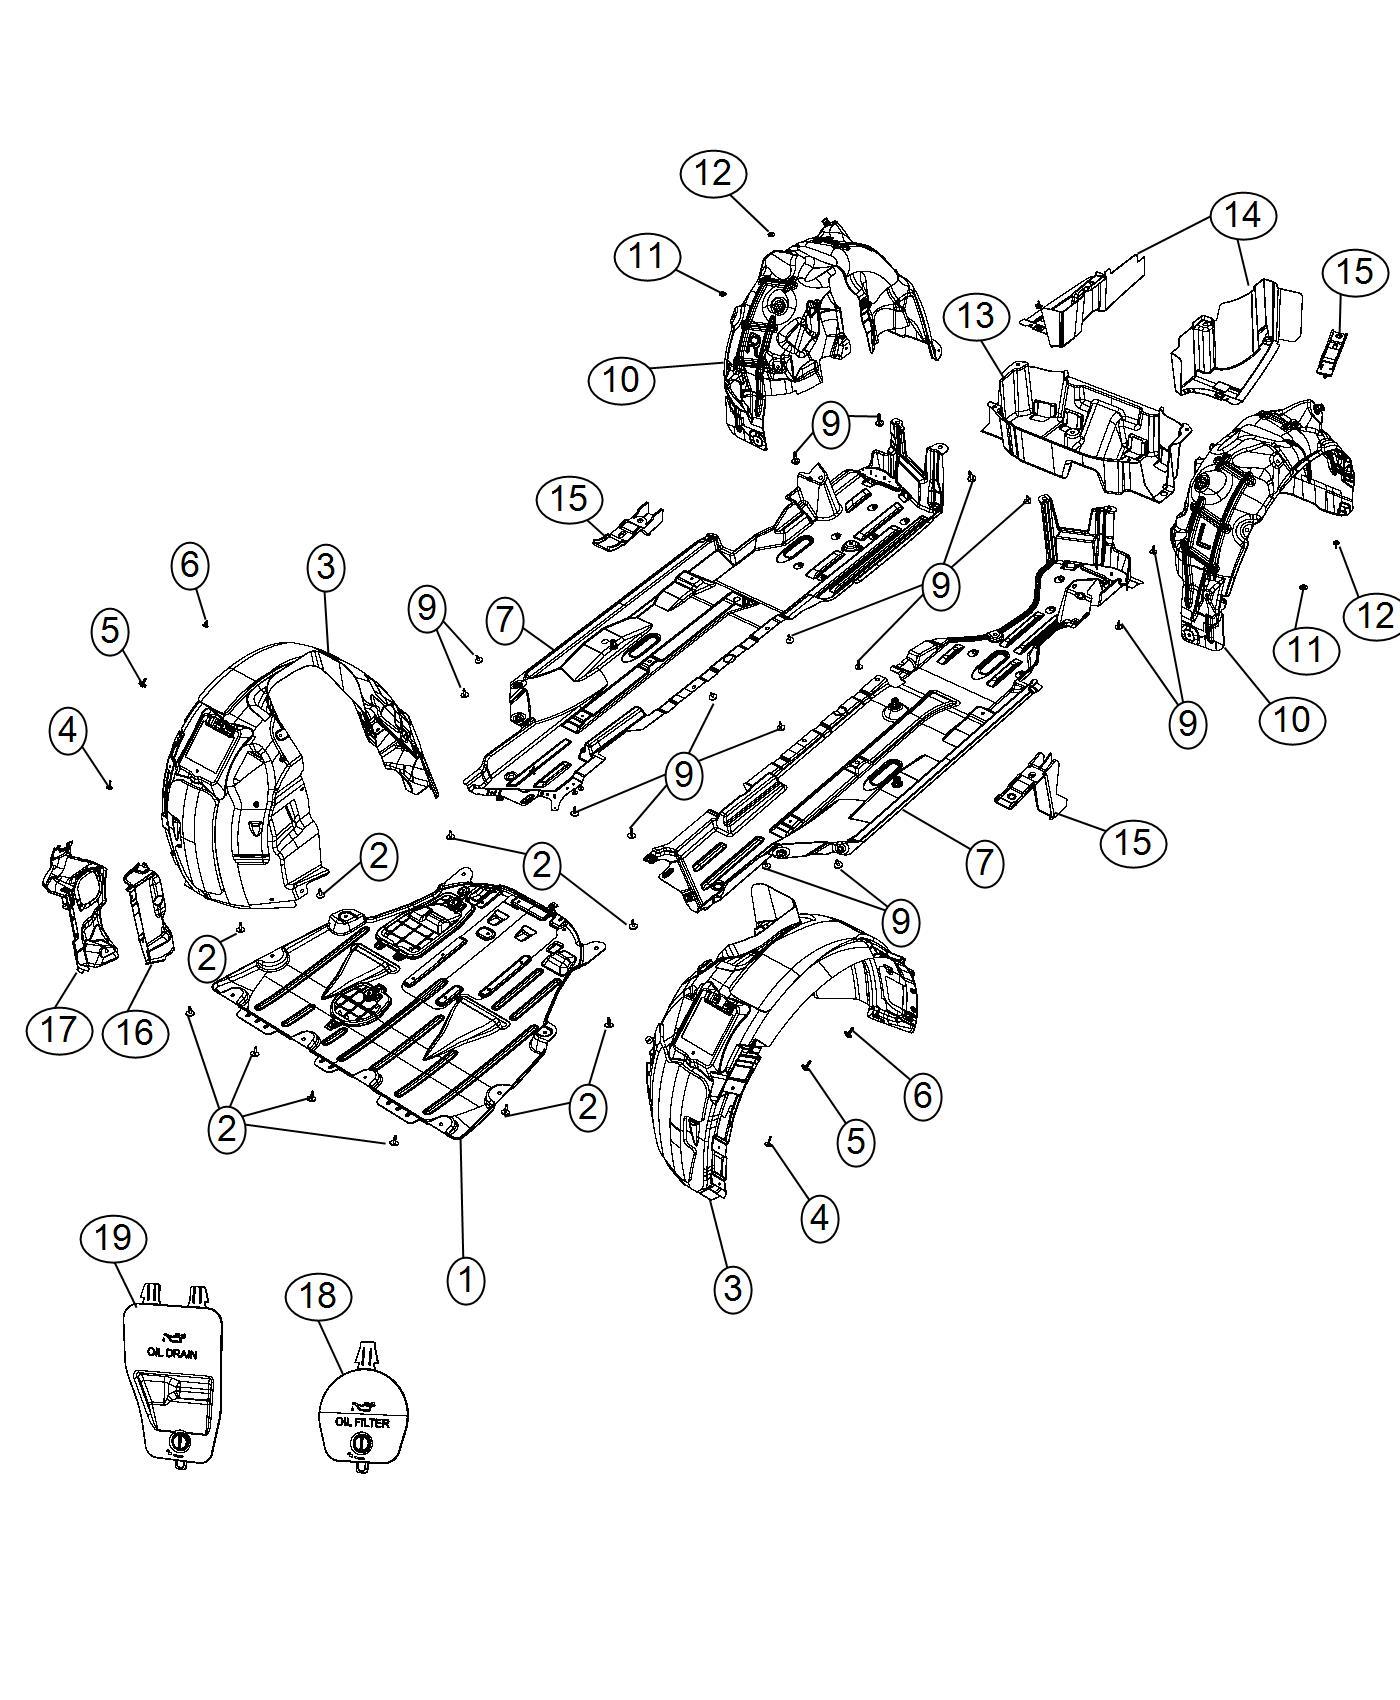 Chrysler 200 Panel Diffuser Rear Suspension